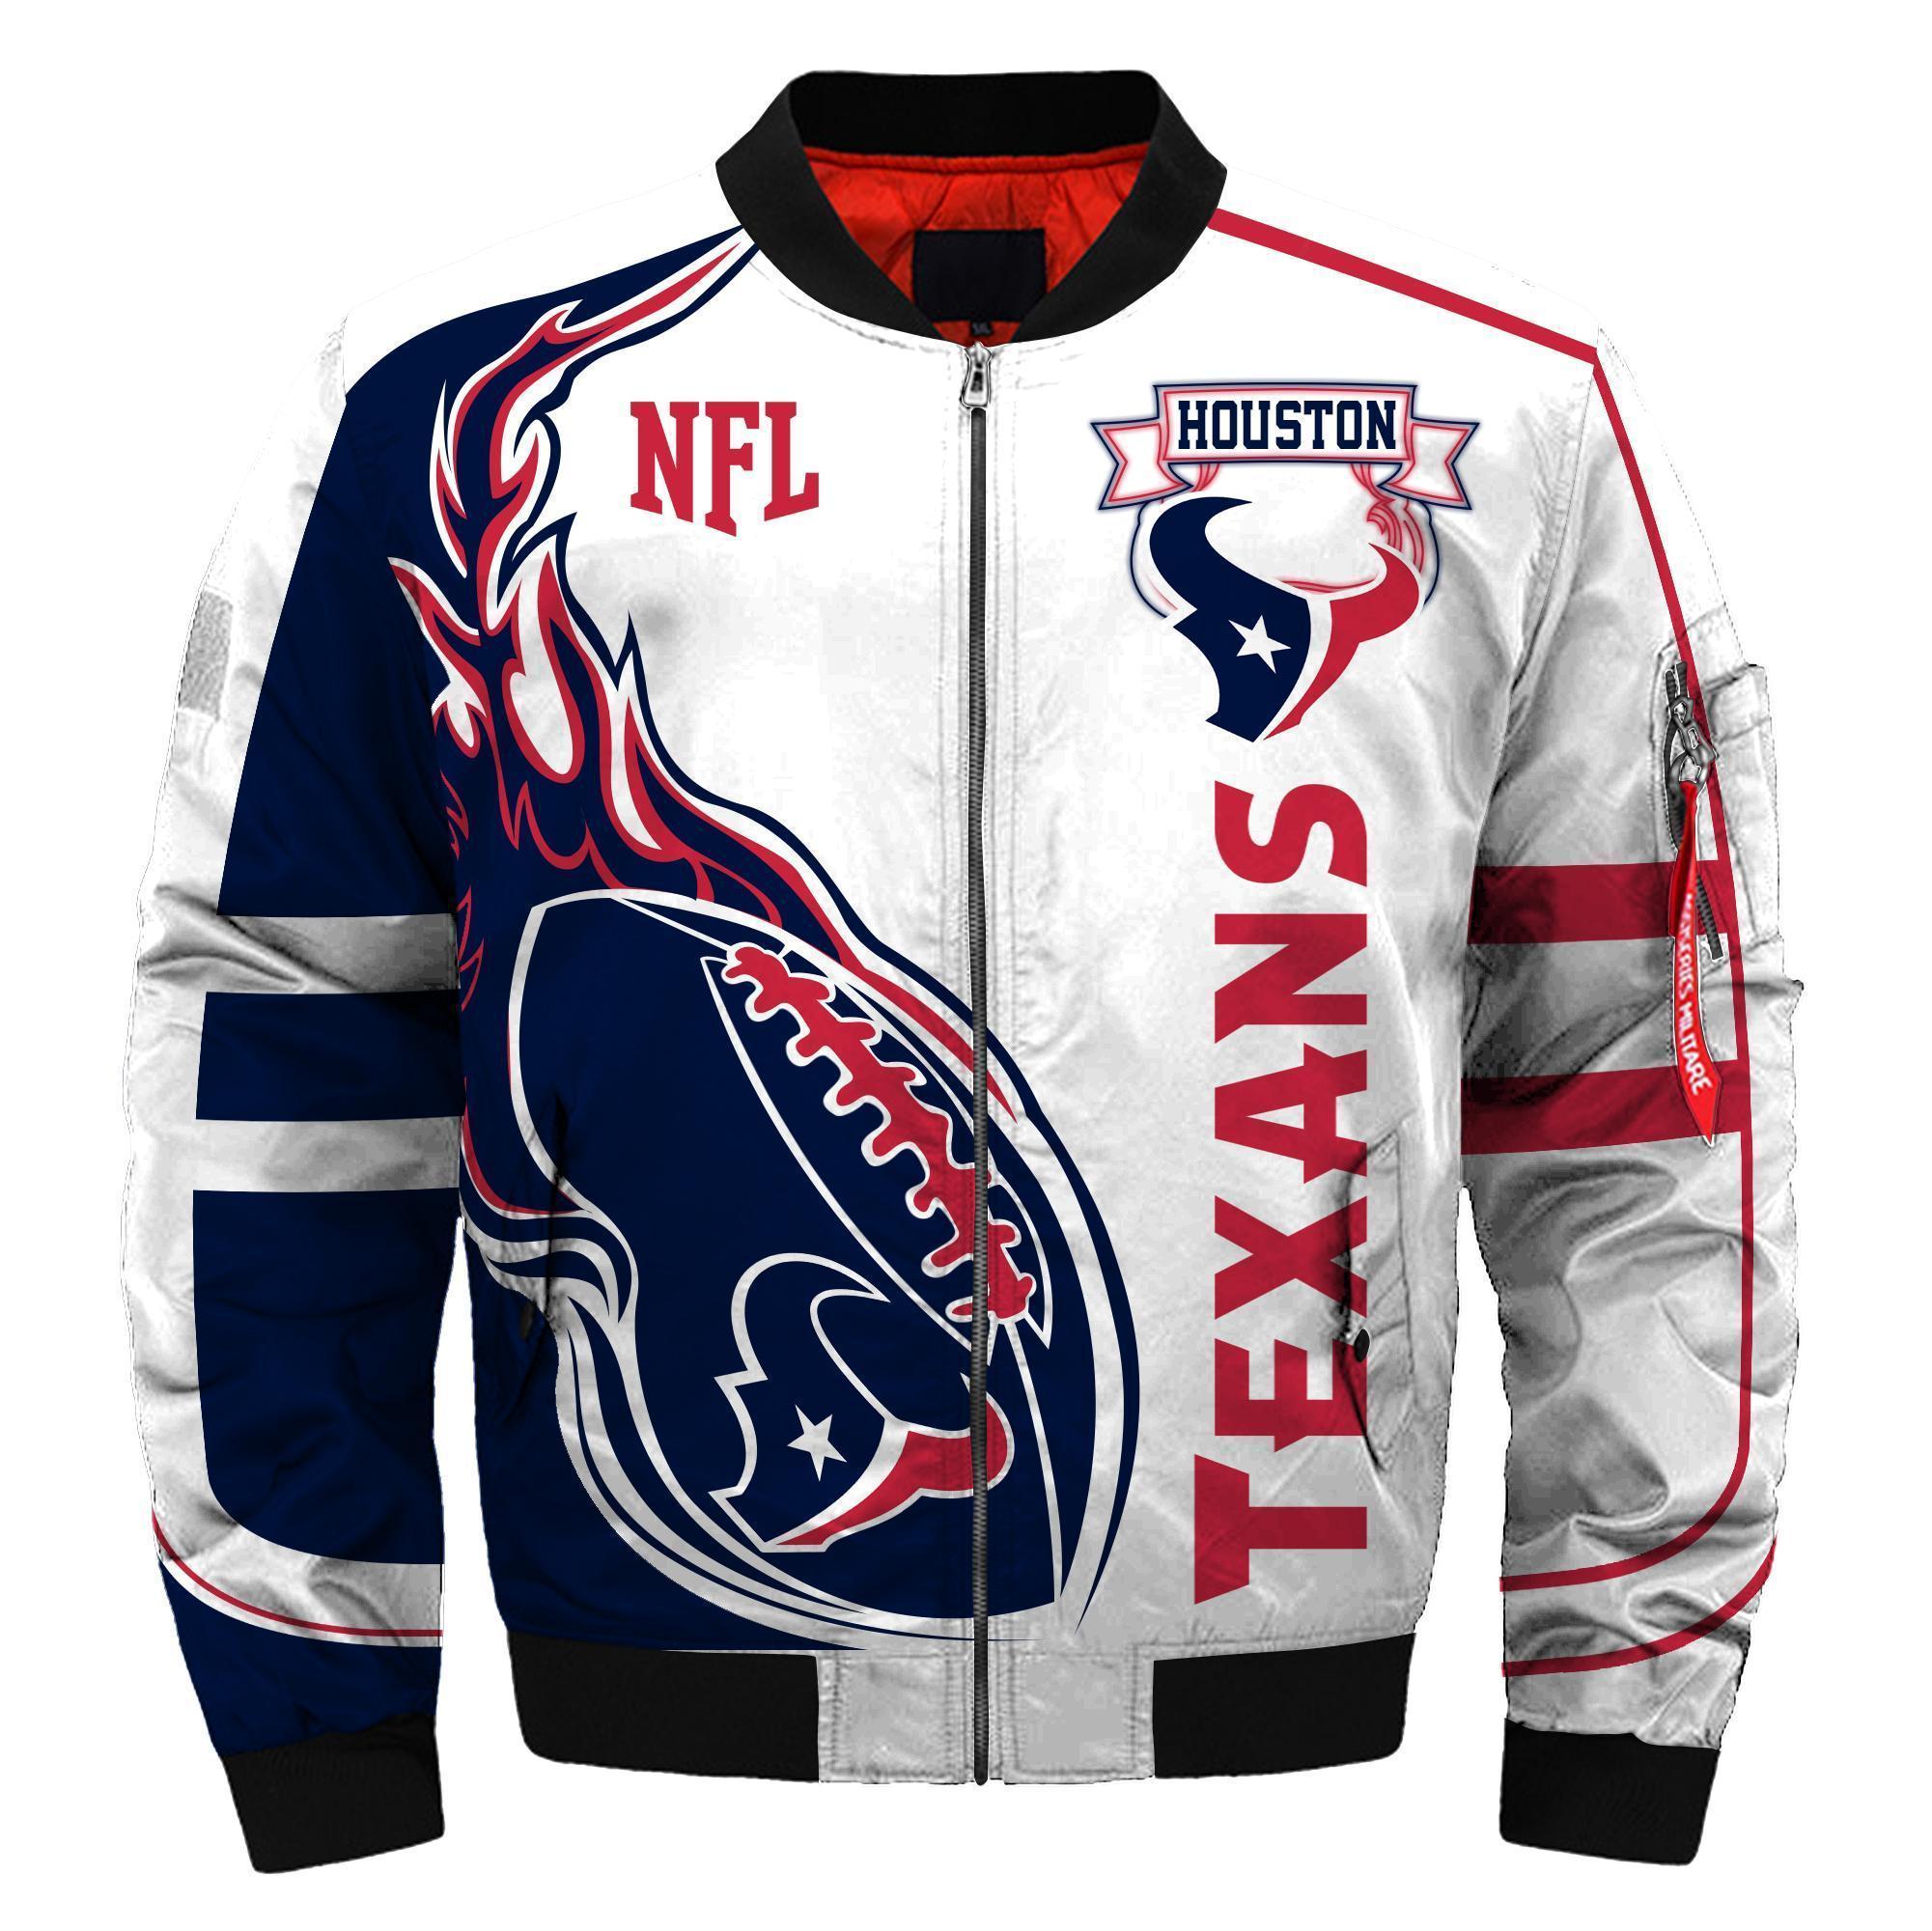 009 Nfl Houston Texans Custom North Face Winter Jacket Bomer High Quality Plus Size Jacket